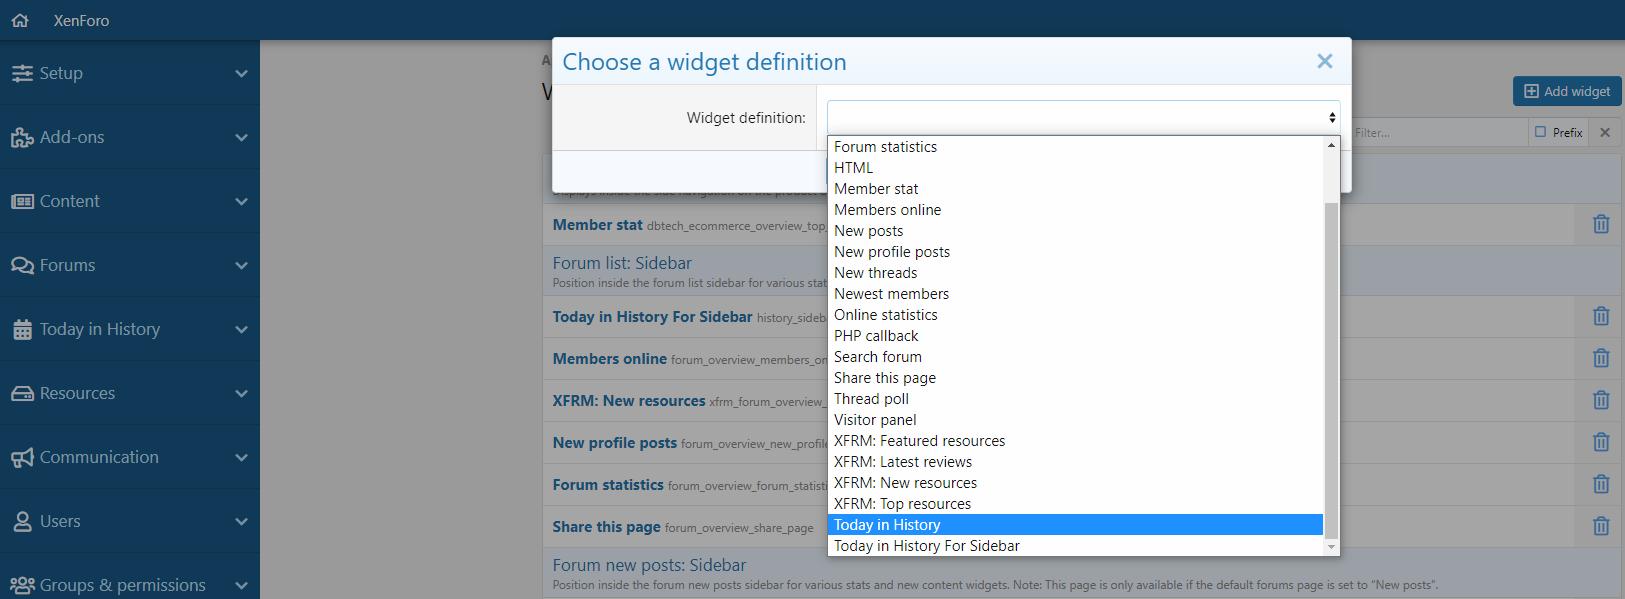 6-TodayHistory_Widget_Type_List.png